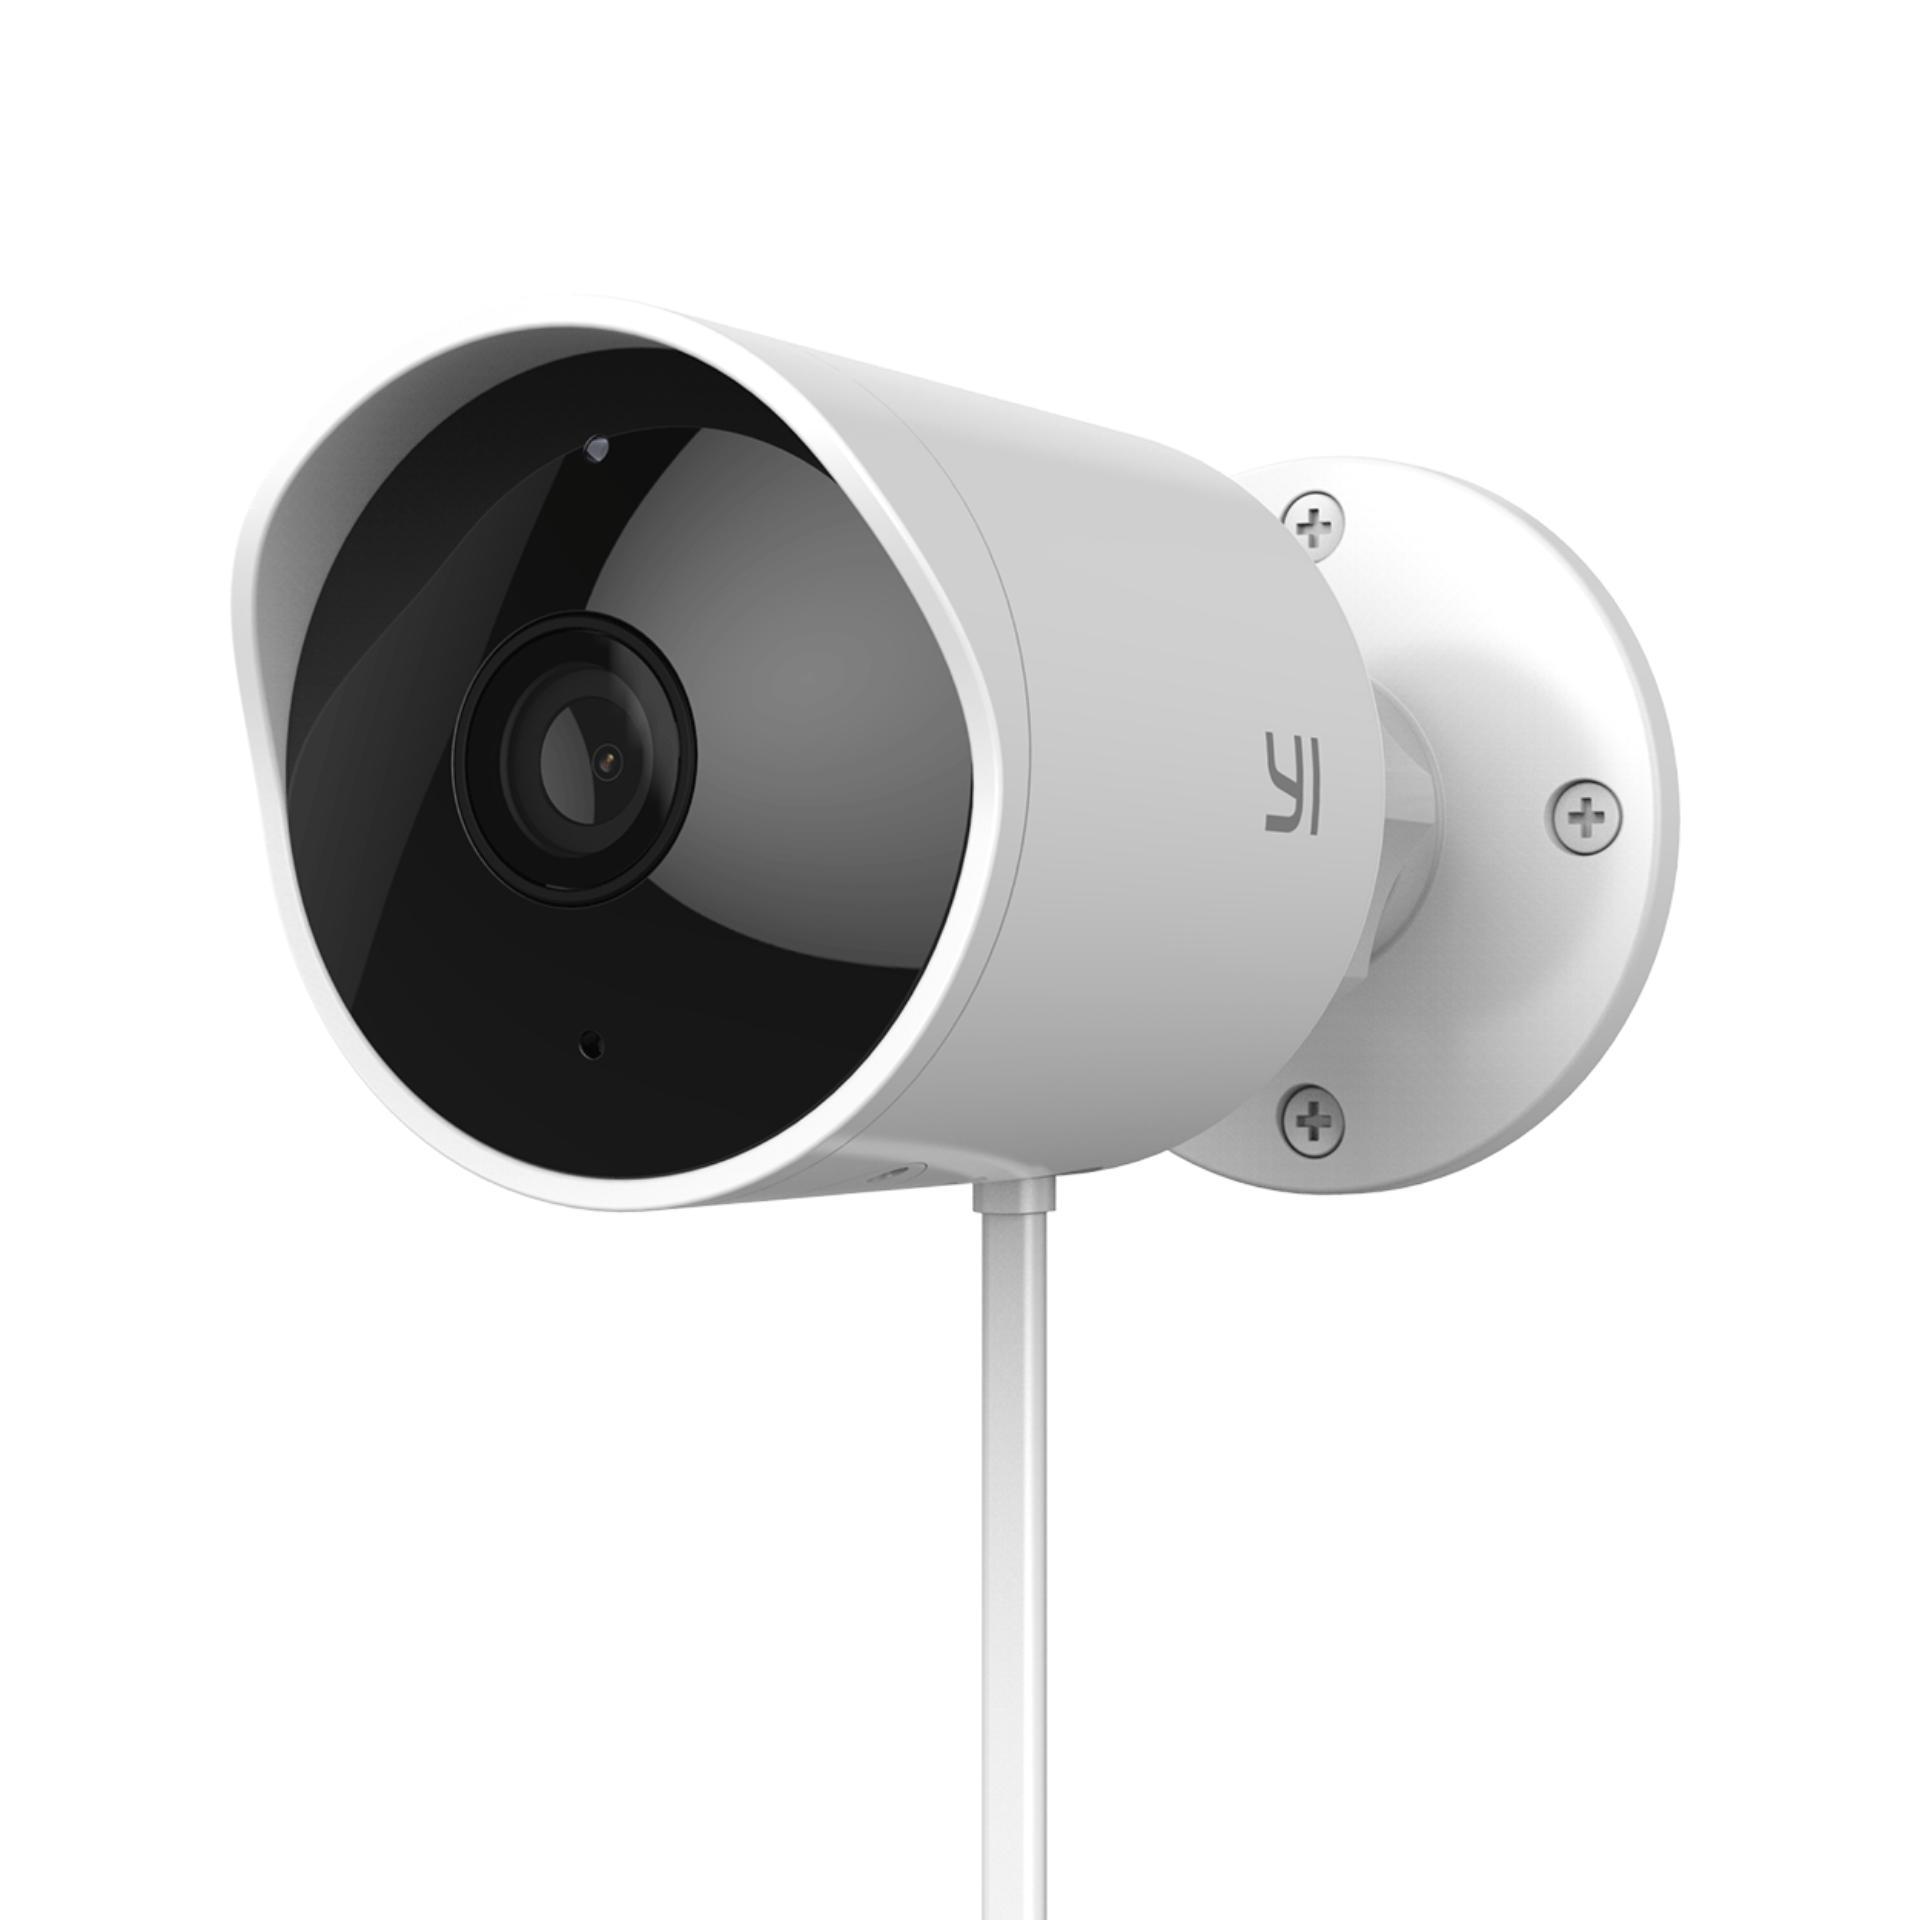 Yi Weatherproof Outdoor Camera FHD 1080p (White)